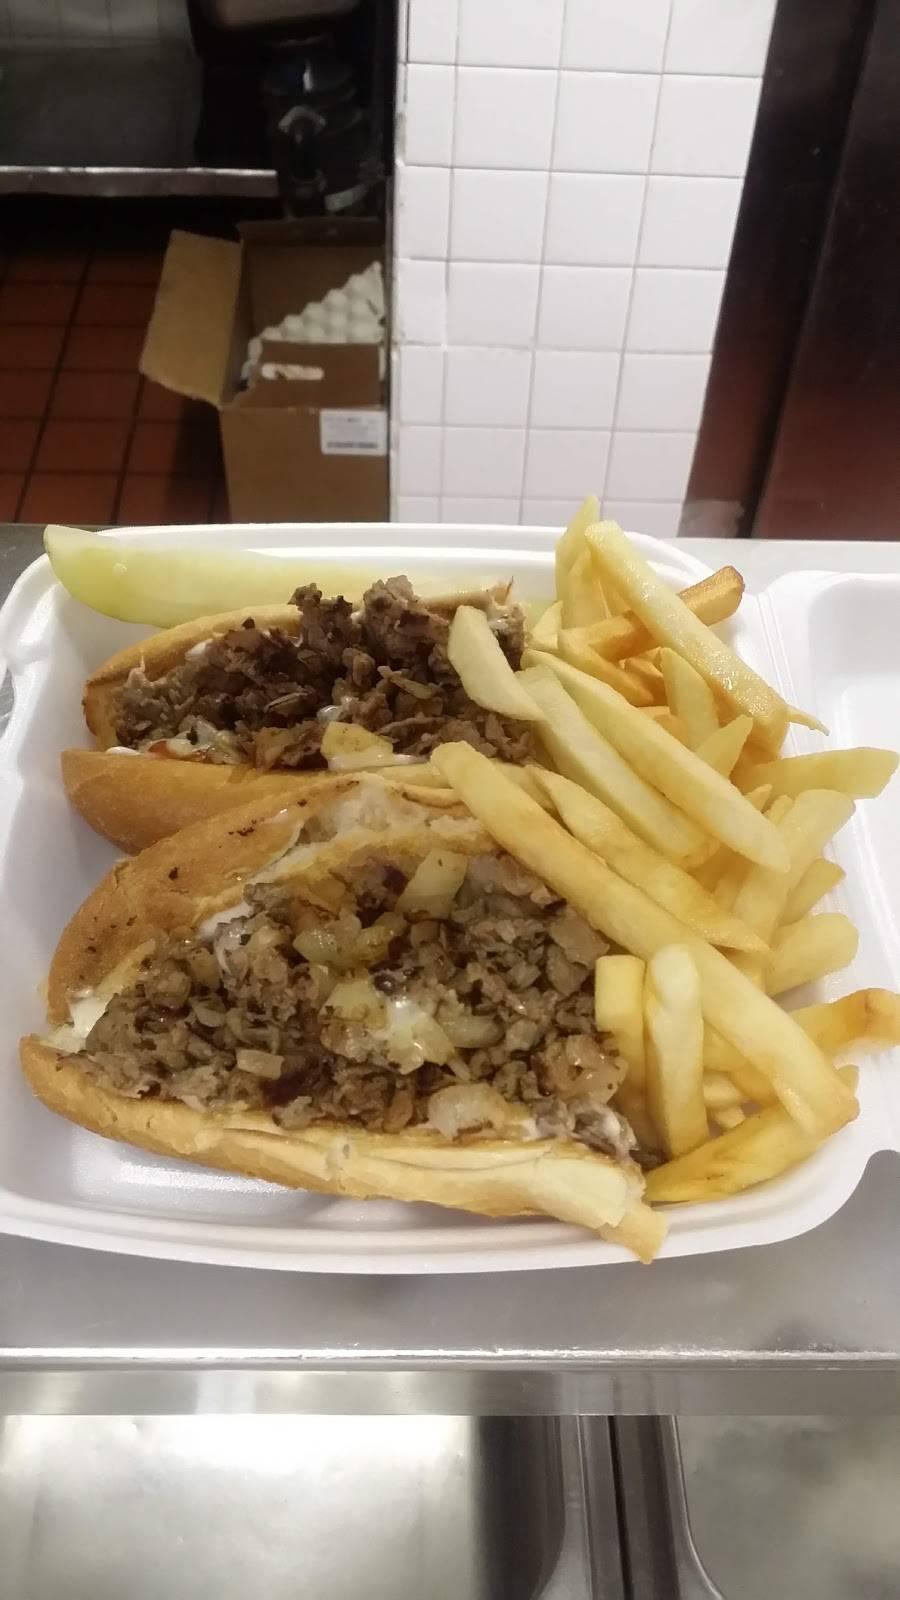 Original Liberty Bell Restaurant | restaurant | 5213 Frankford Ave, Philadelphia, PA 19124, USA | 2155353555 OR +1 215-535-3555